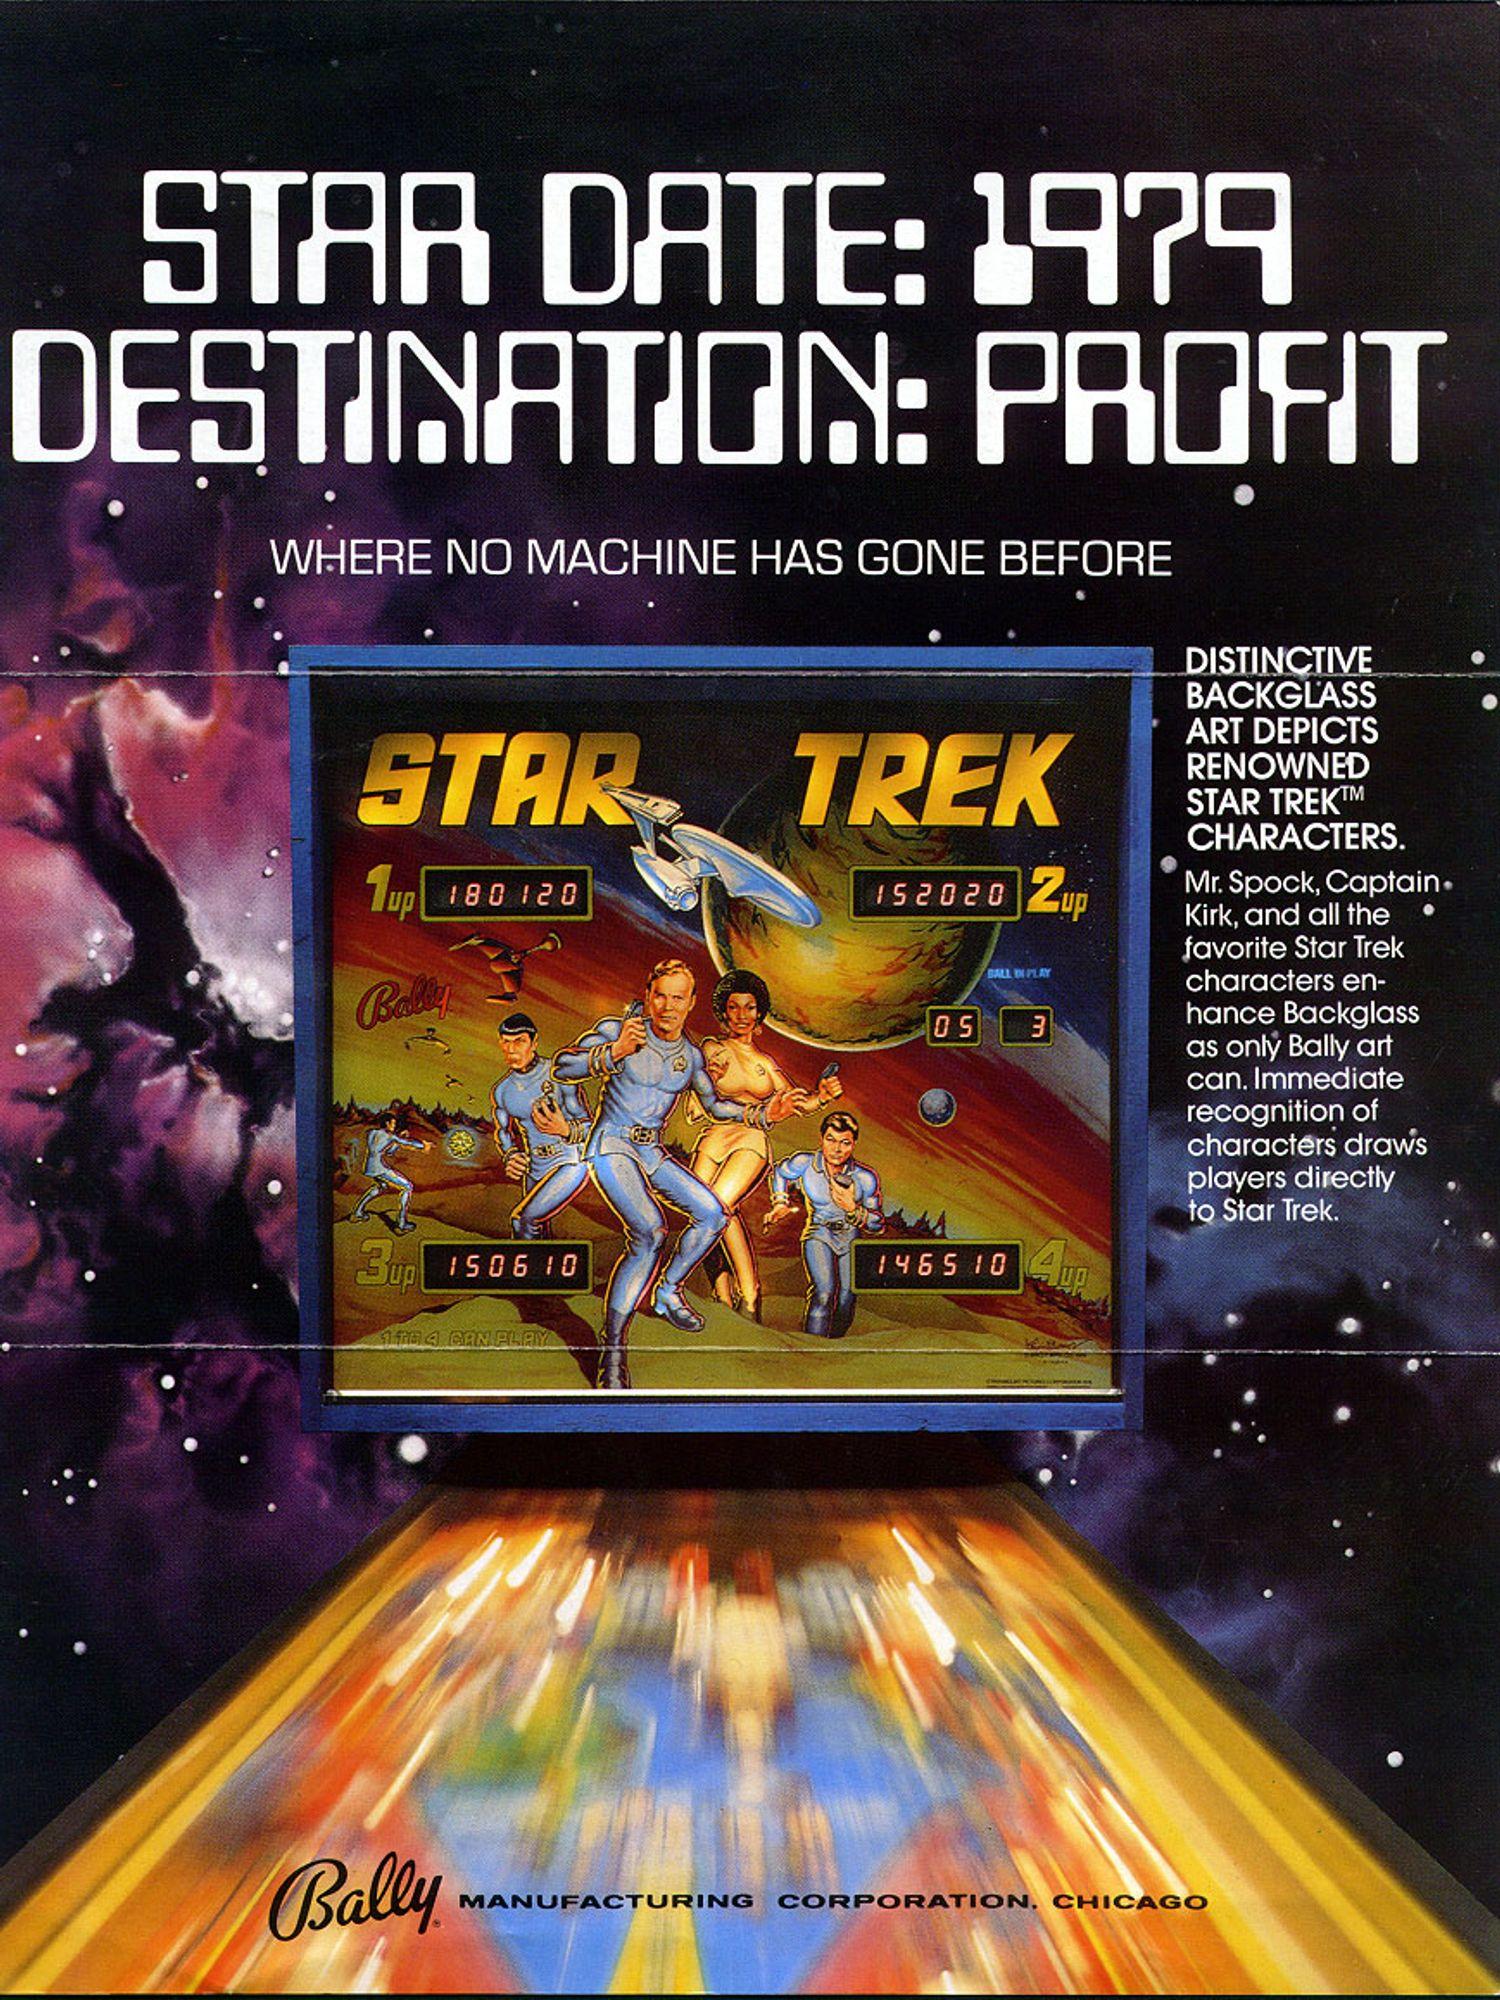 Star Trek Flyer front